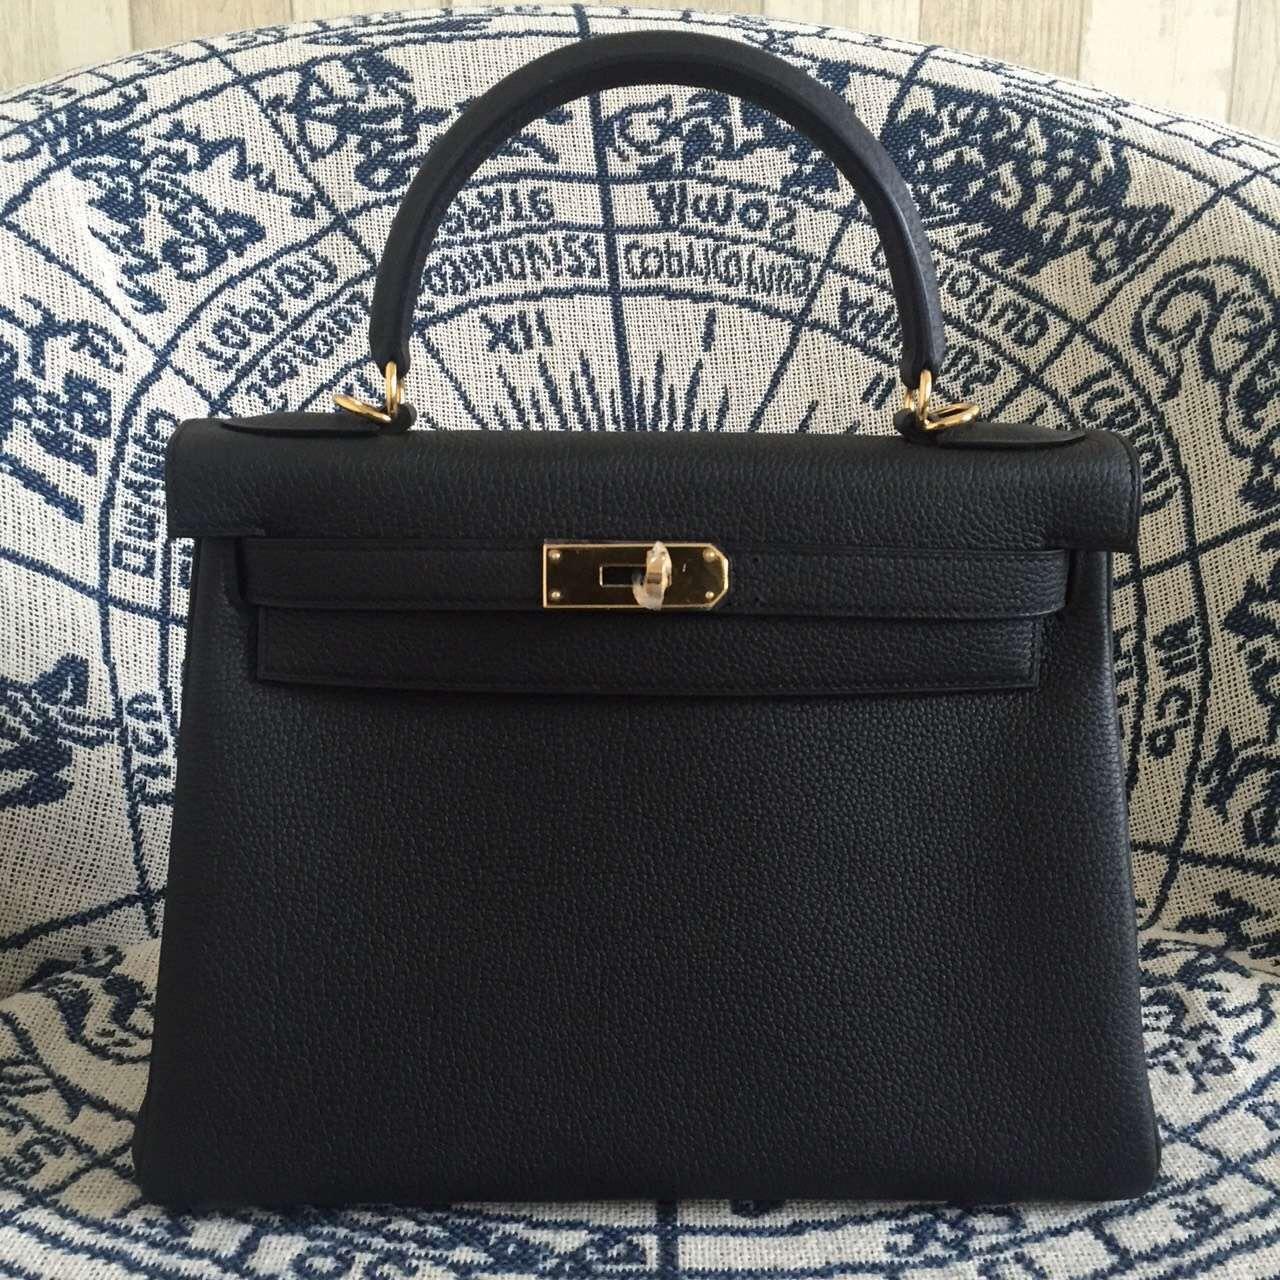 39e3954e0b45 Hermes Kelly 28cm Bag Togo Leather Black Gold